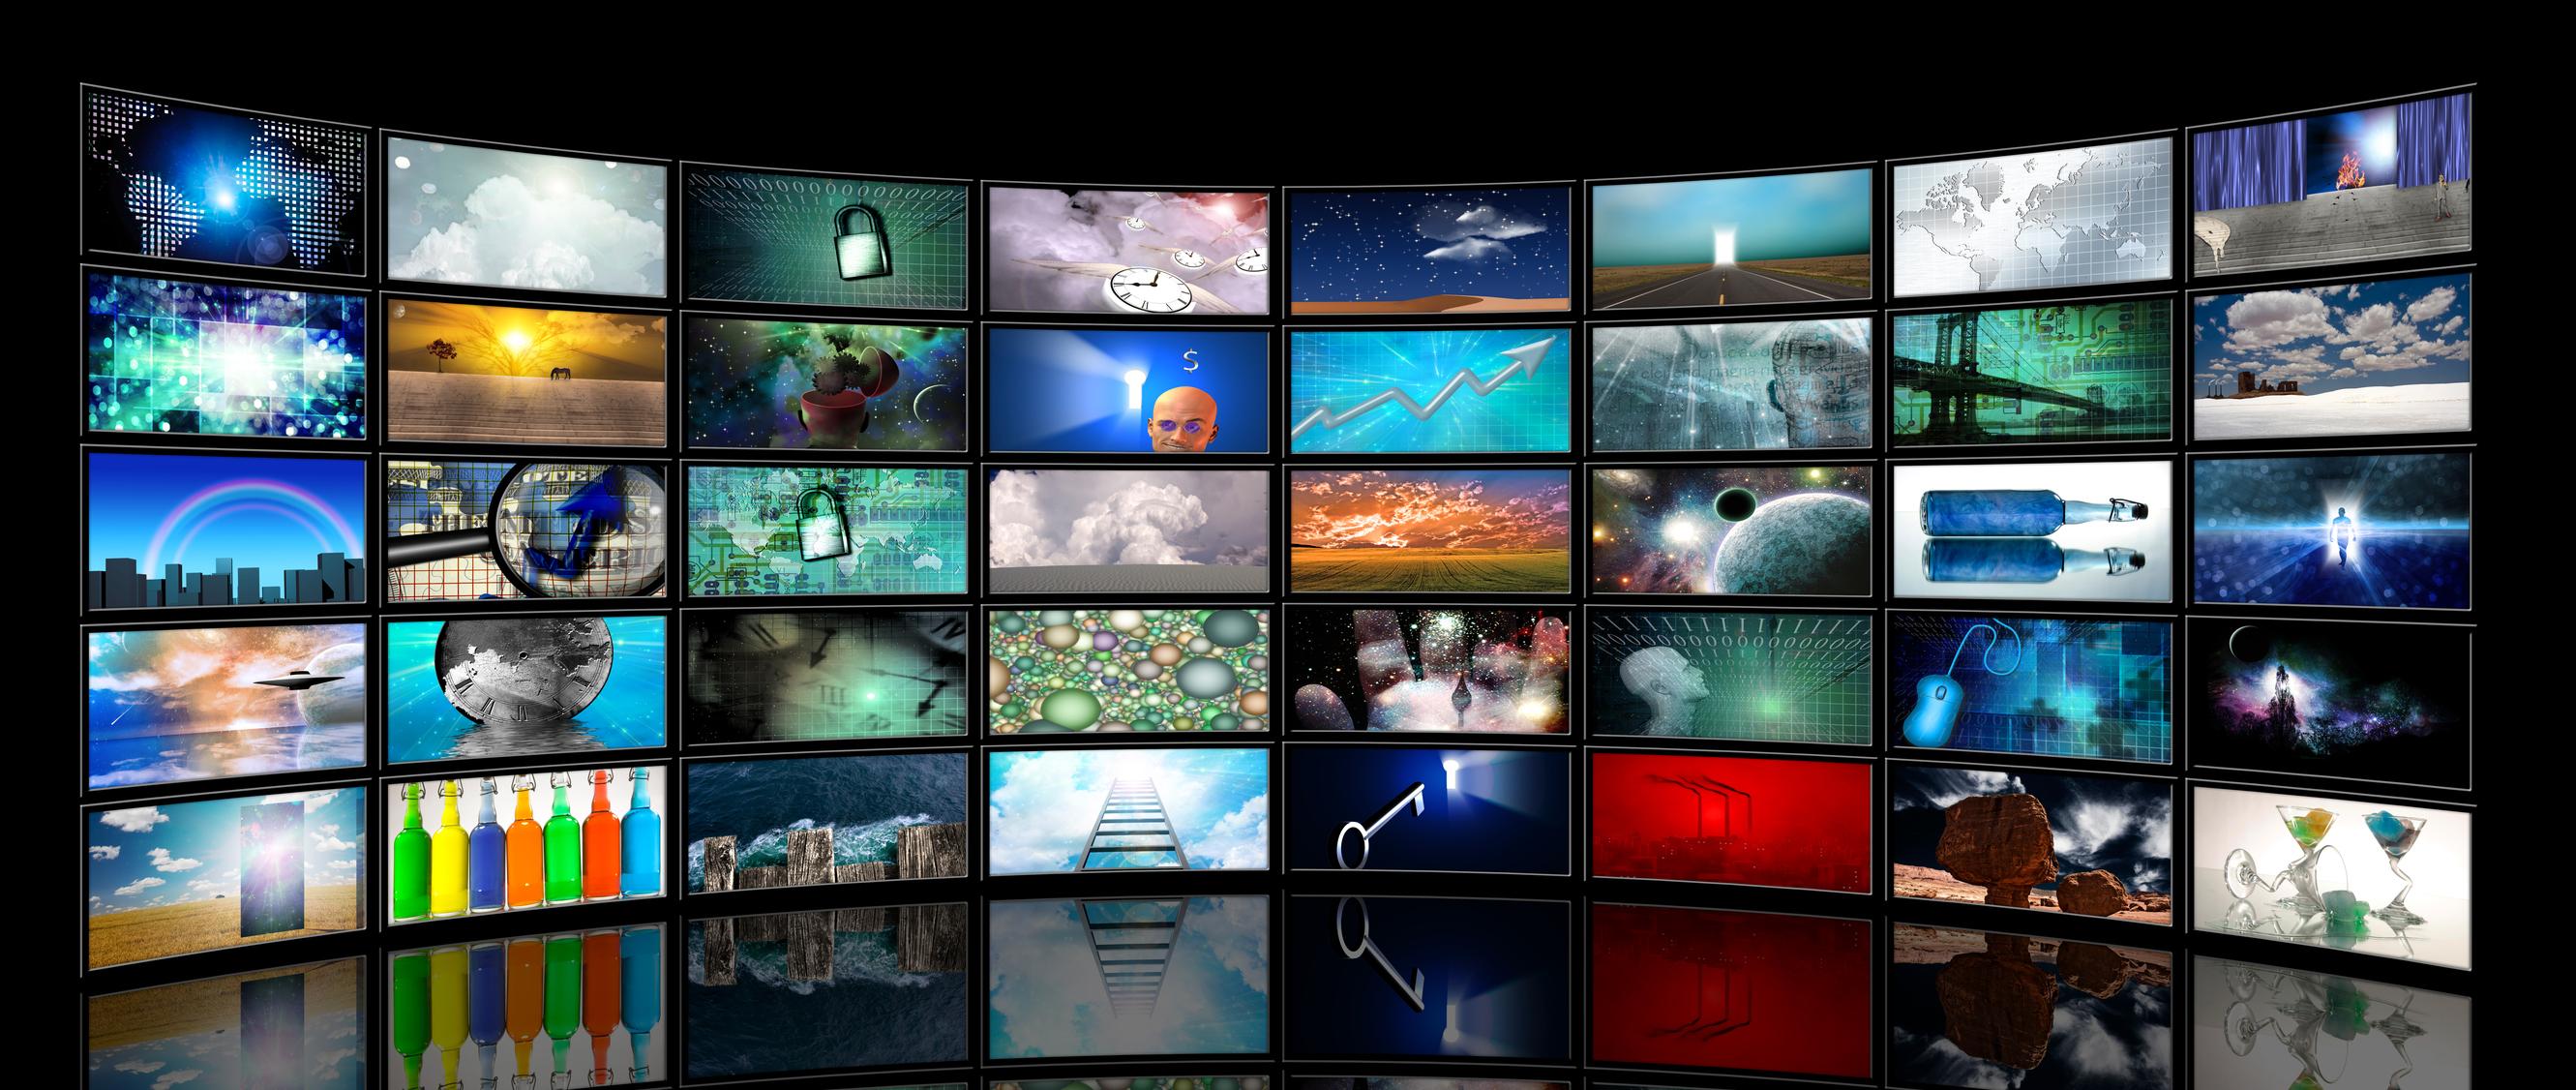 Several rows of bright TFT LCD display screens on a wall.